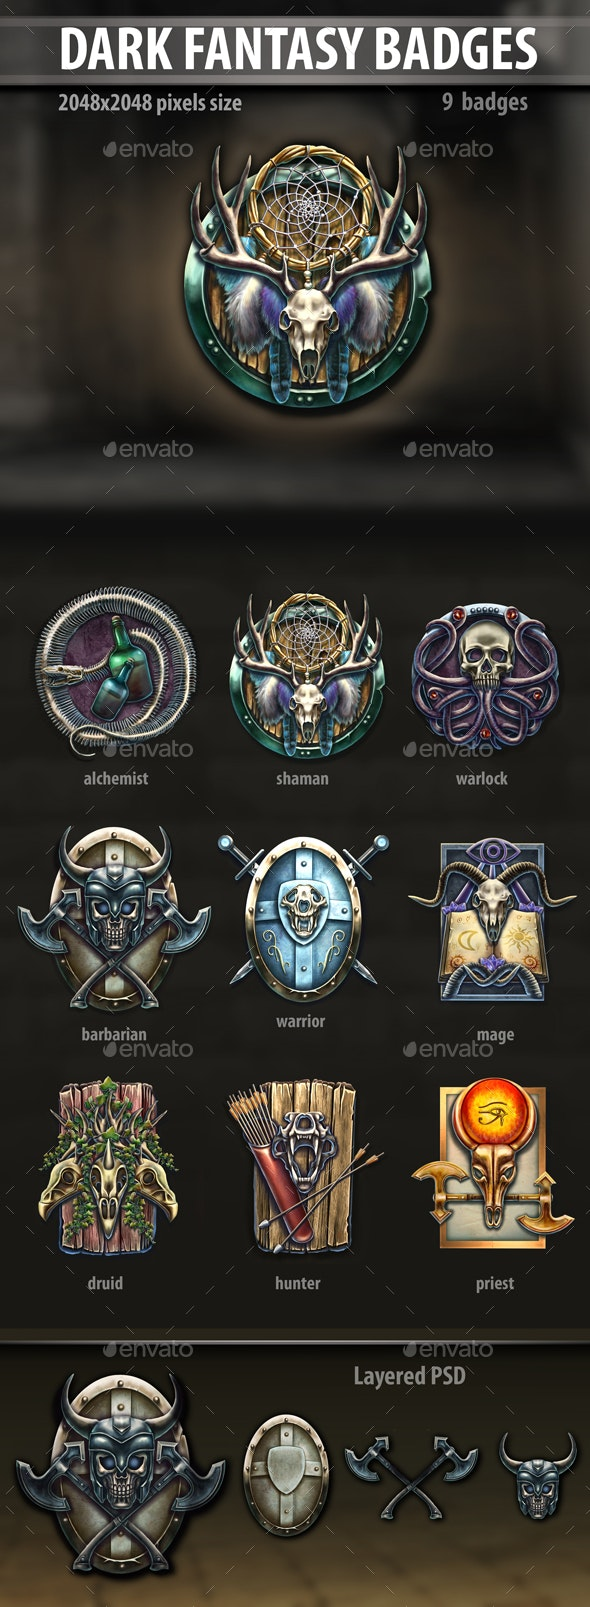 Dark Fantasy Badges - Miscellaneous Game Assets